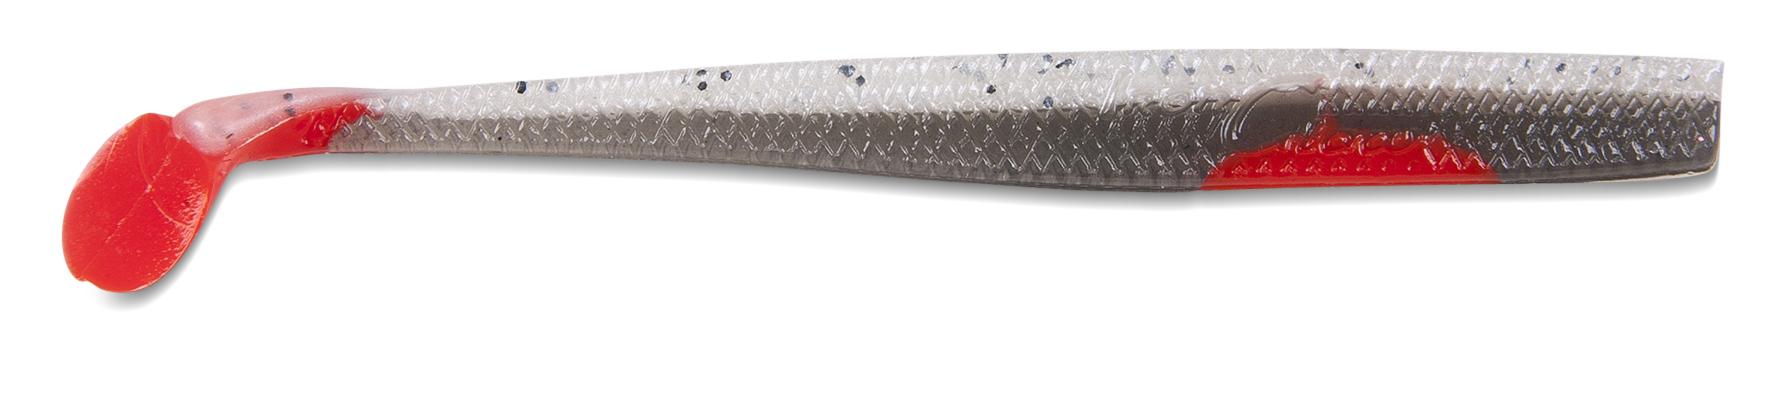 Iron Claw gumová nástraha Skinny Jake 14cm Vzor RB, 3ks